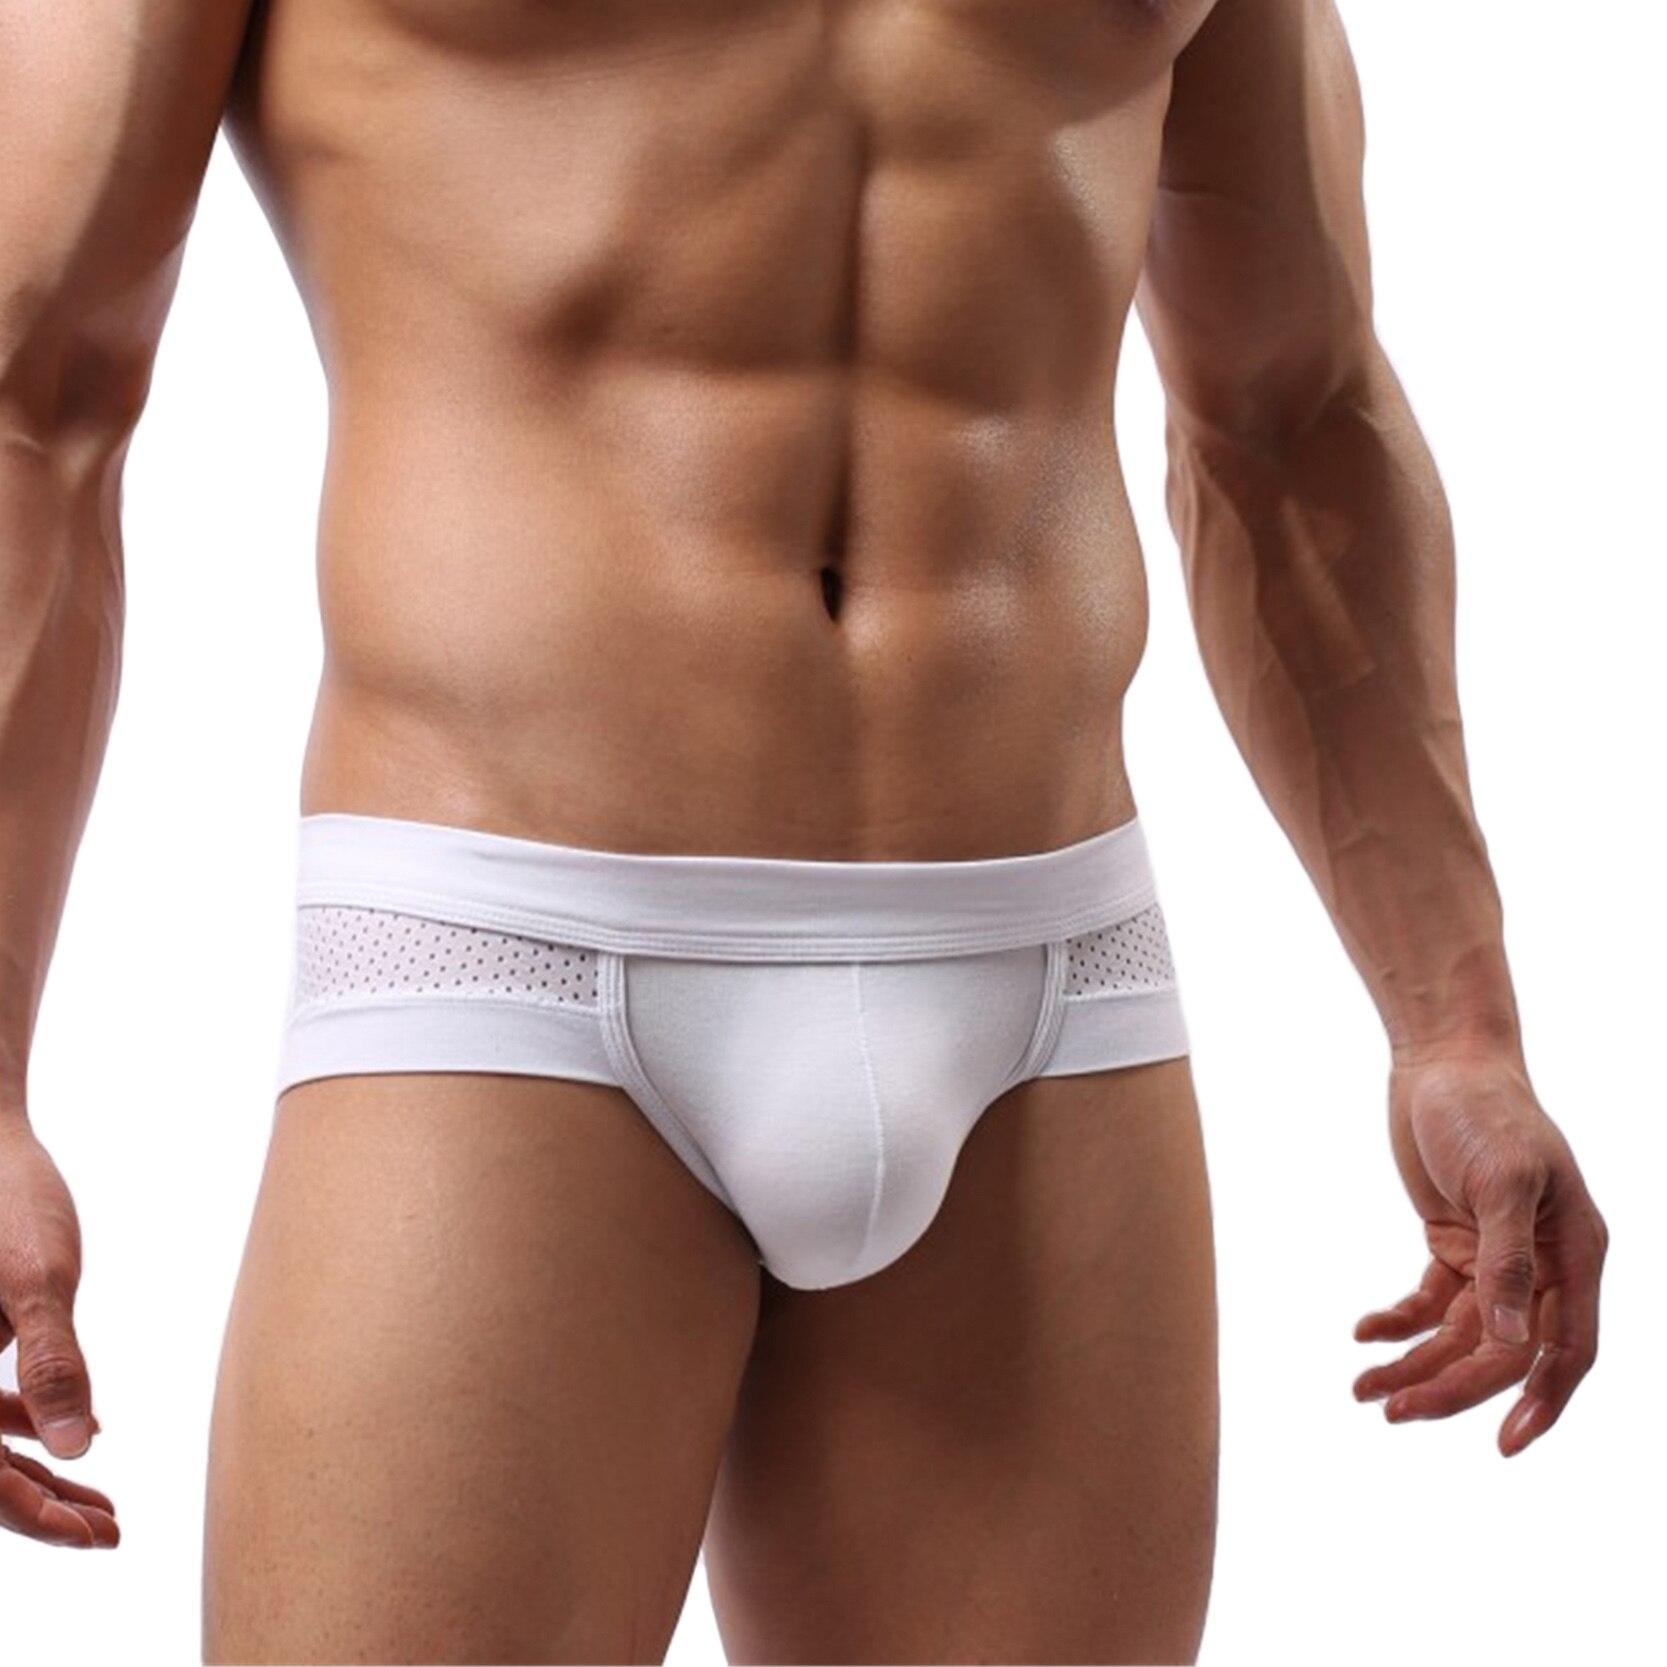 Orlvs men's mesh underpants